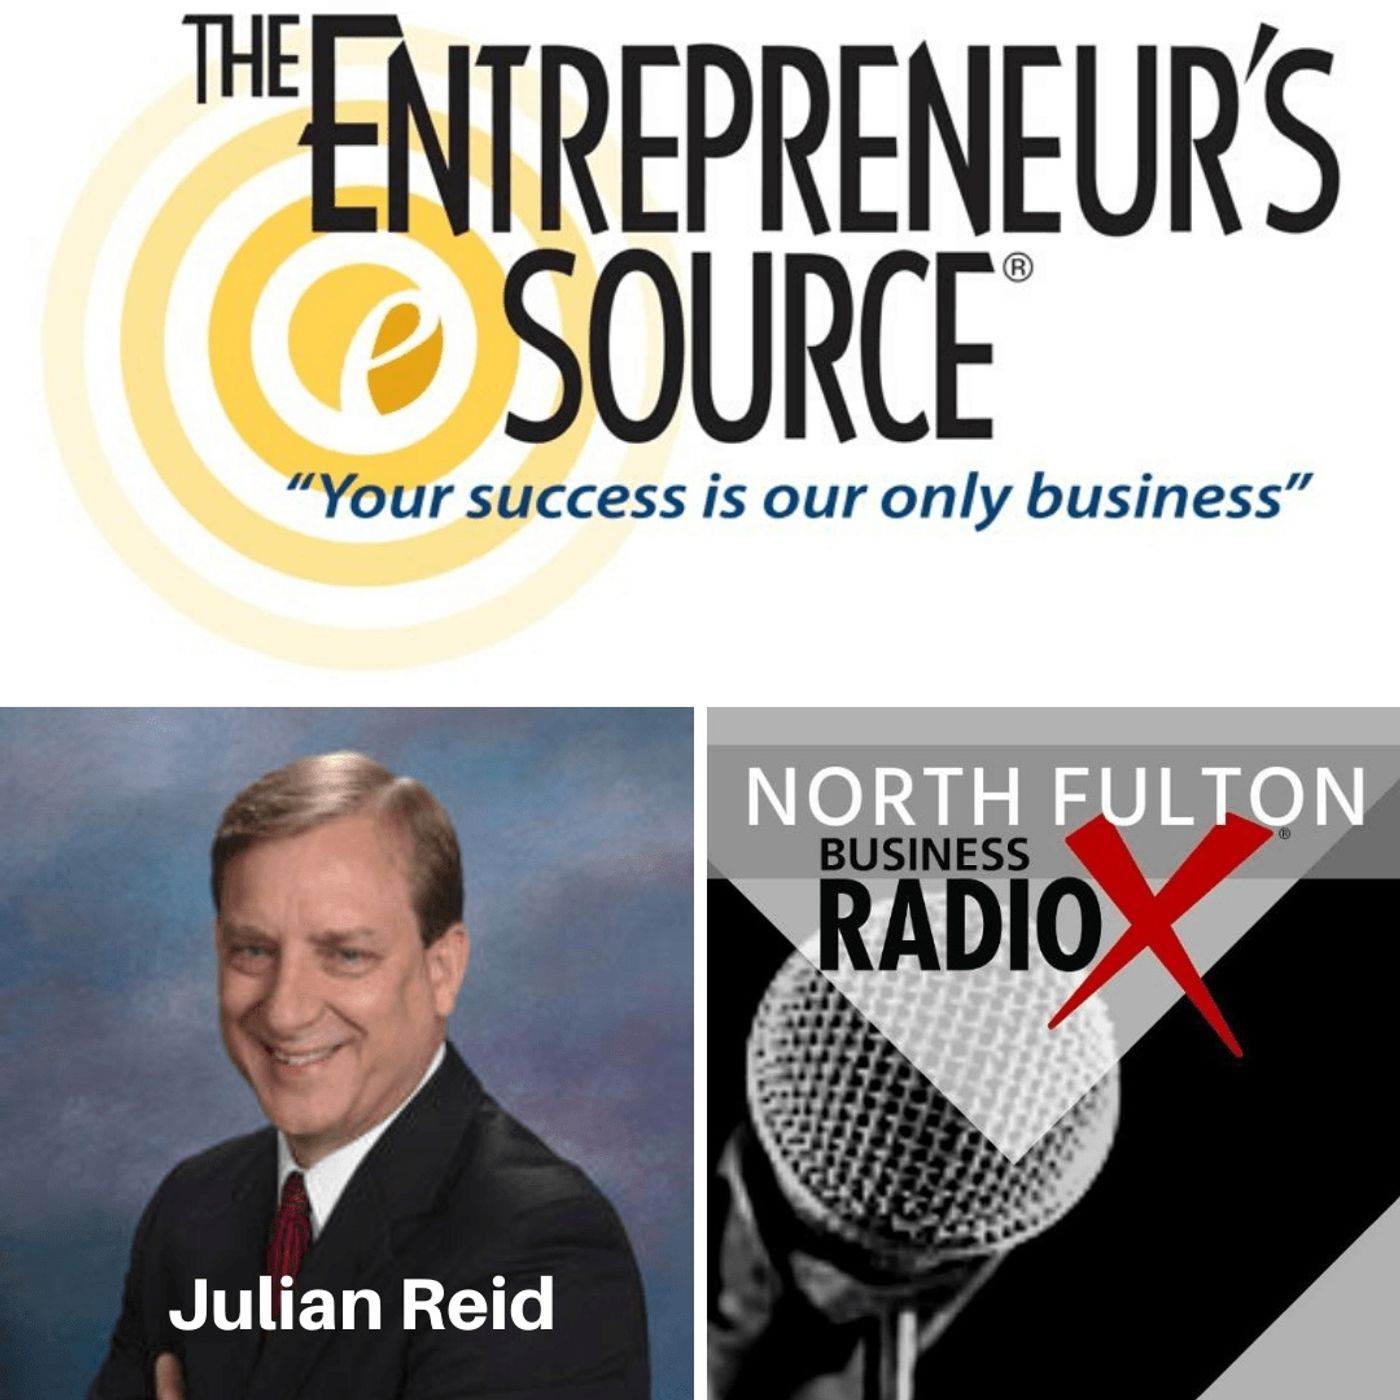 Julian Reid, The Entrepreneur's Source